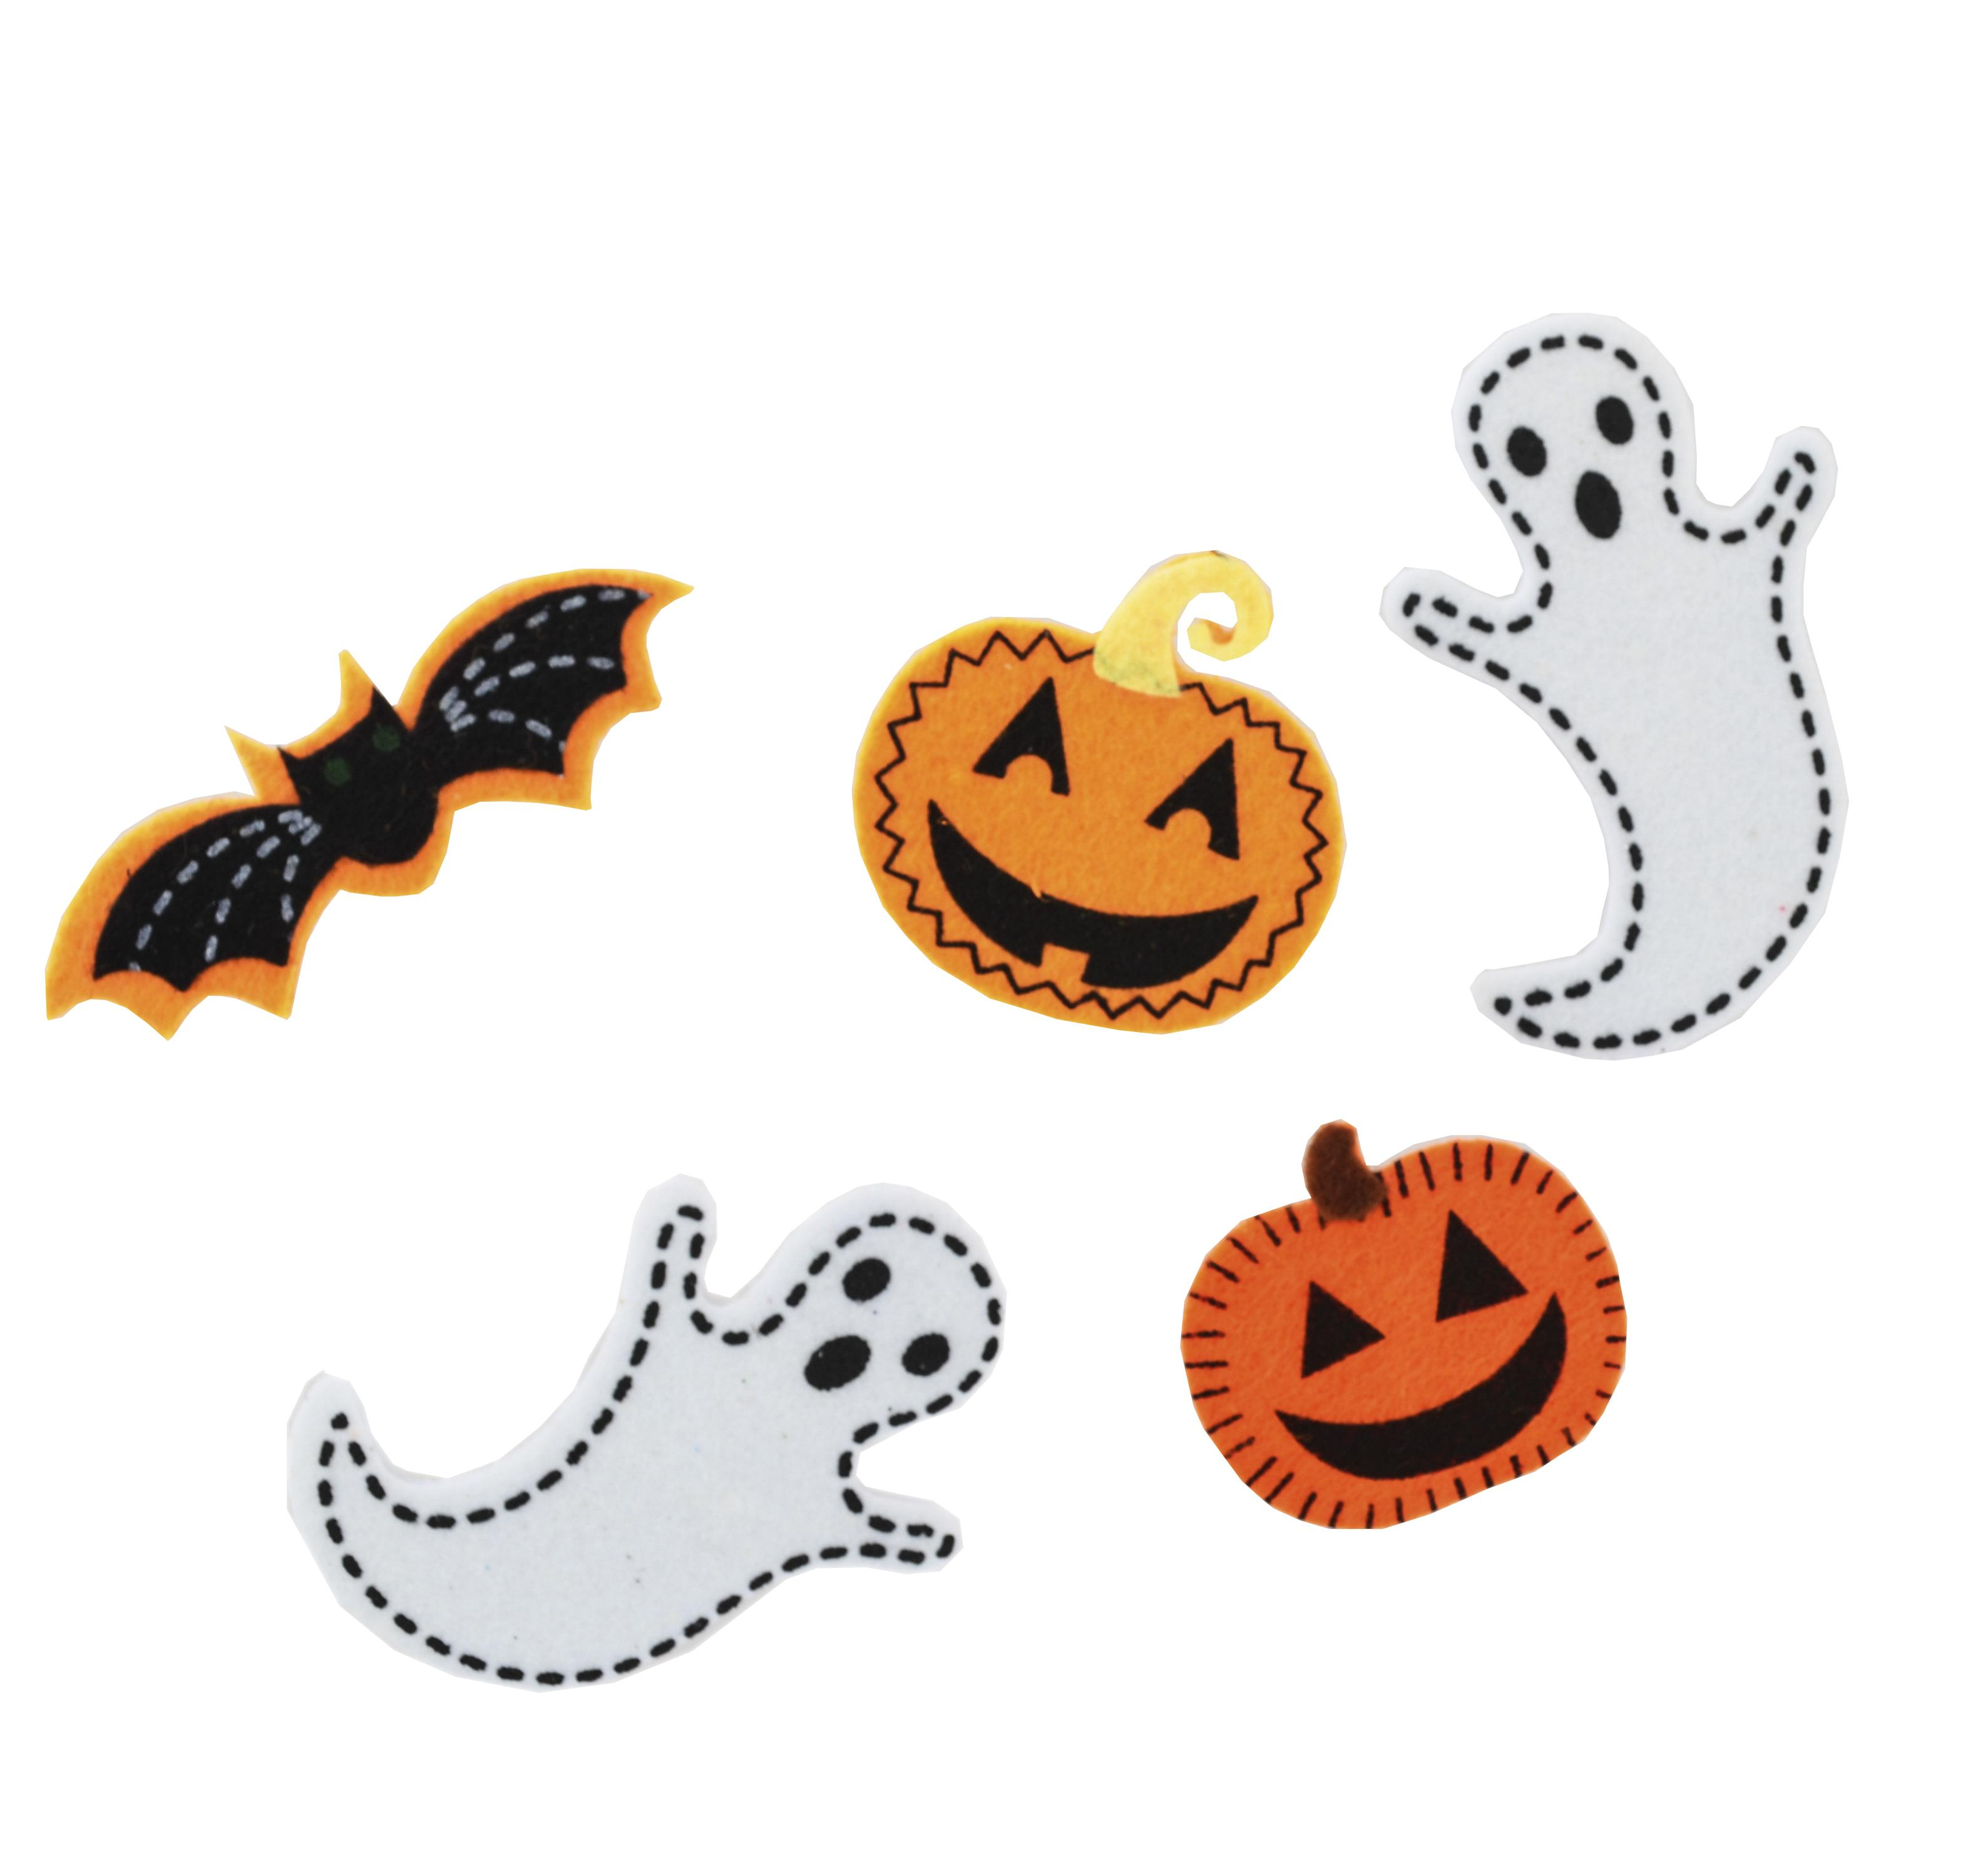 Набор декоративных наклеек из фетра для Хэллоуина № 2, 16 шт.